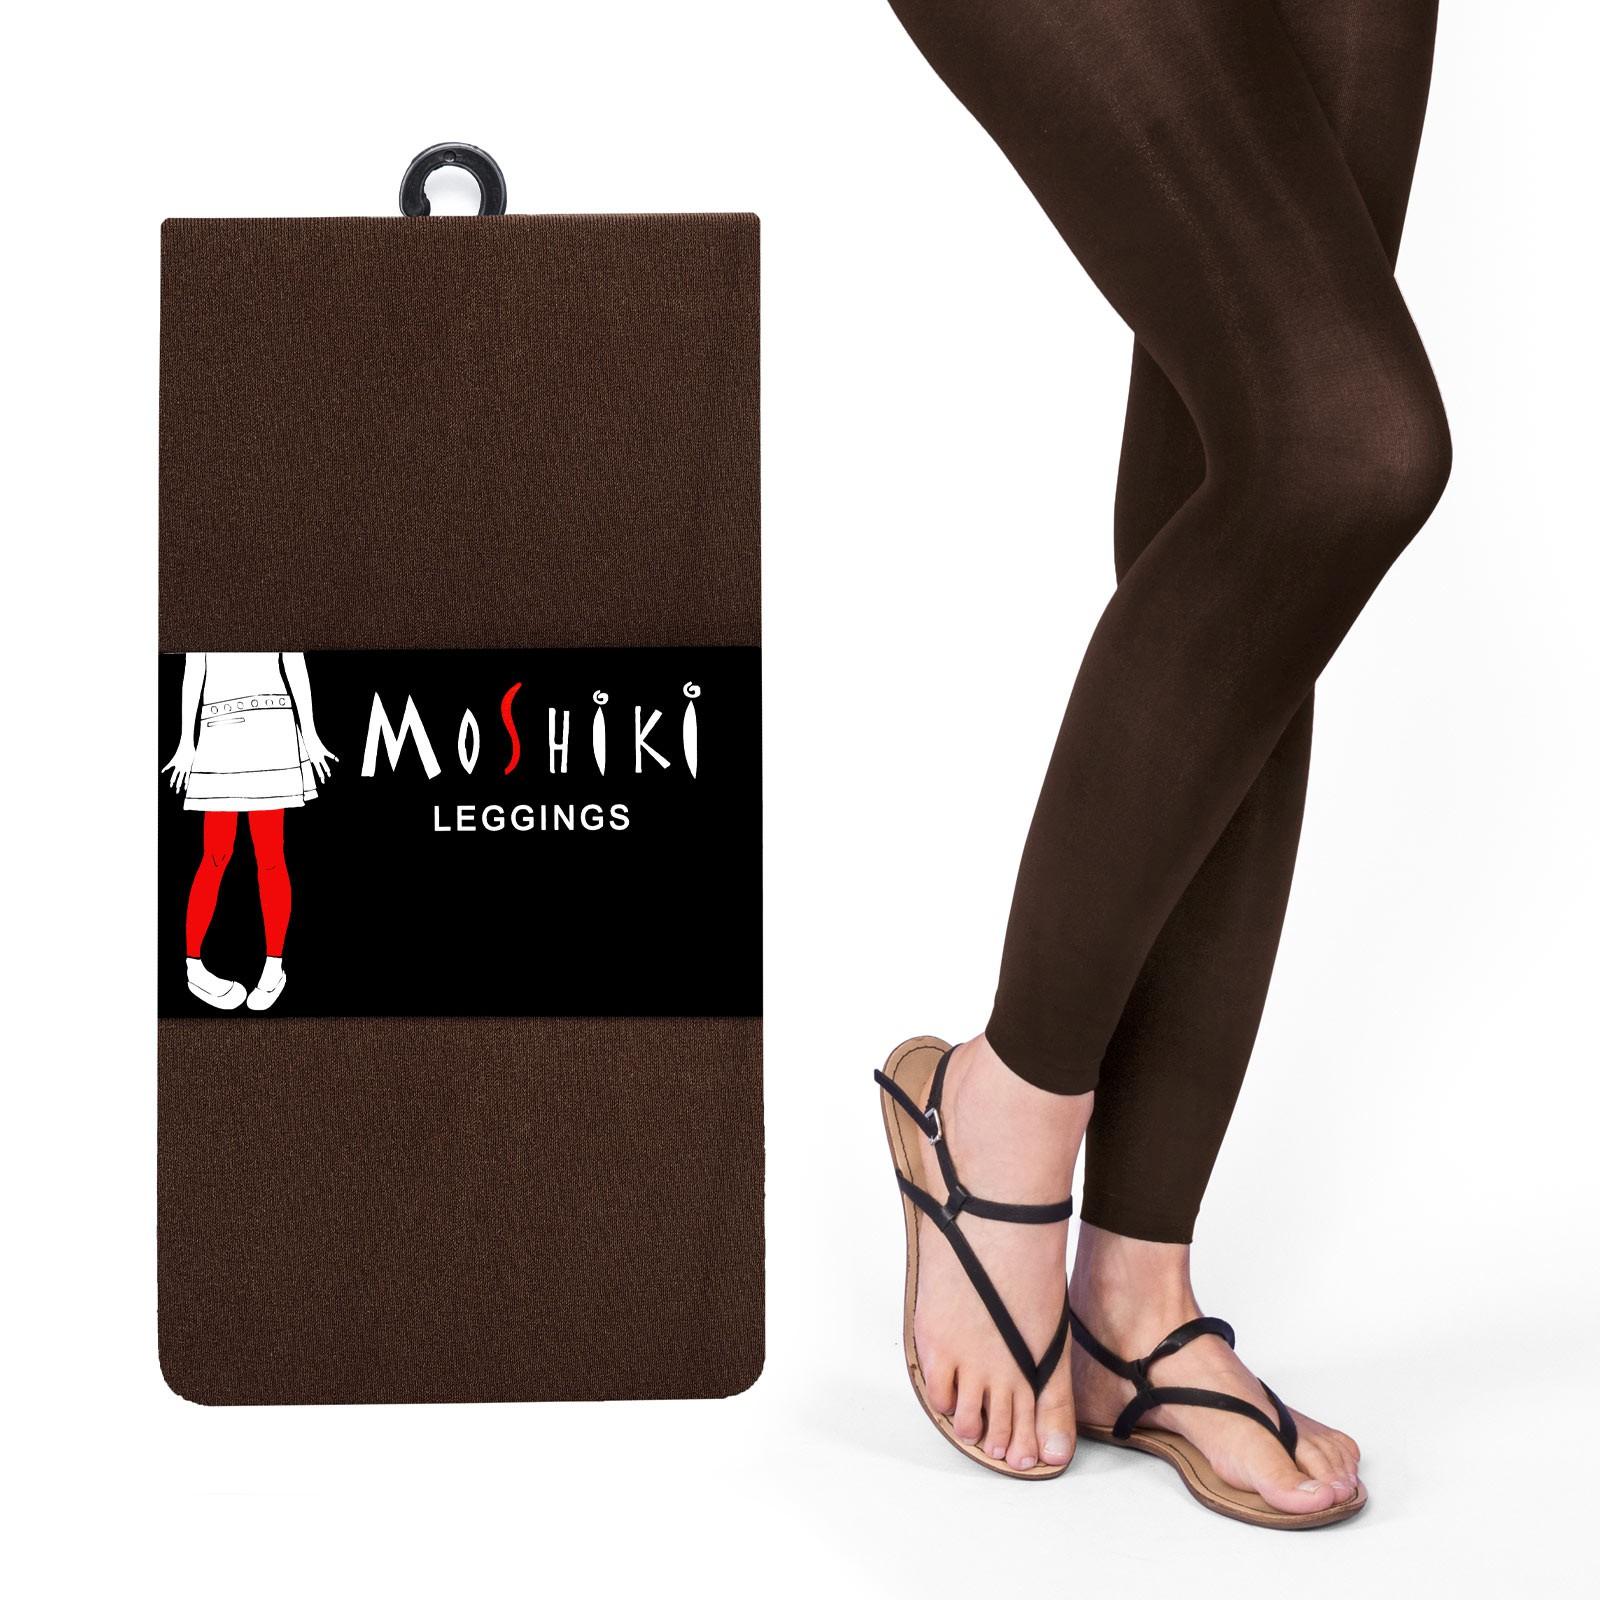 Leggings marron Moshiki taille unique